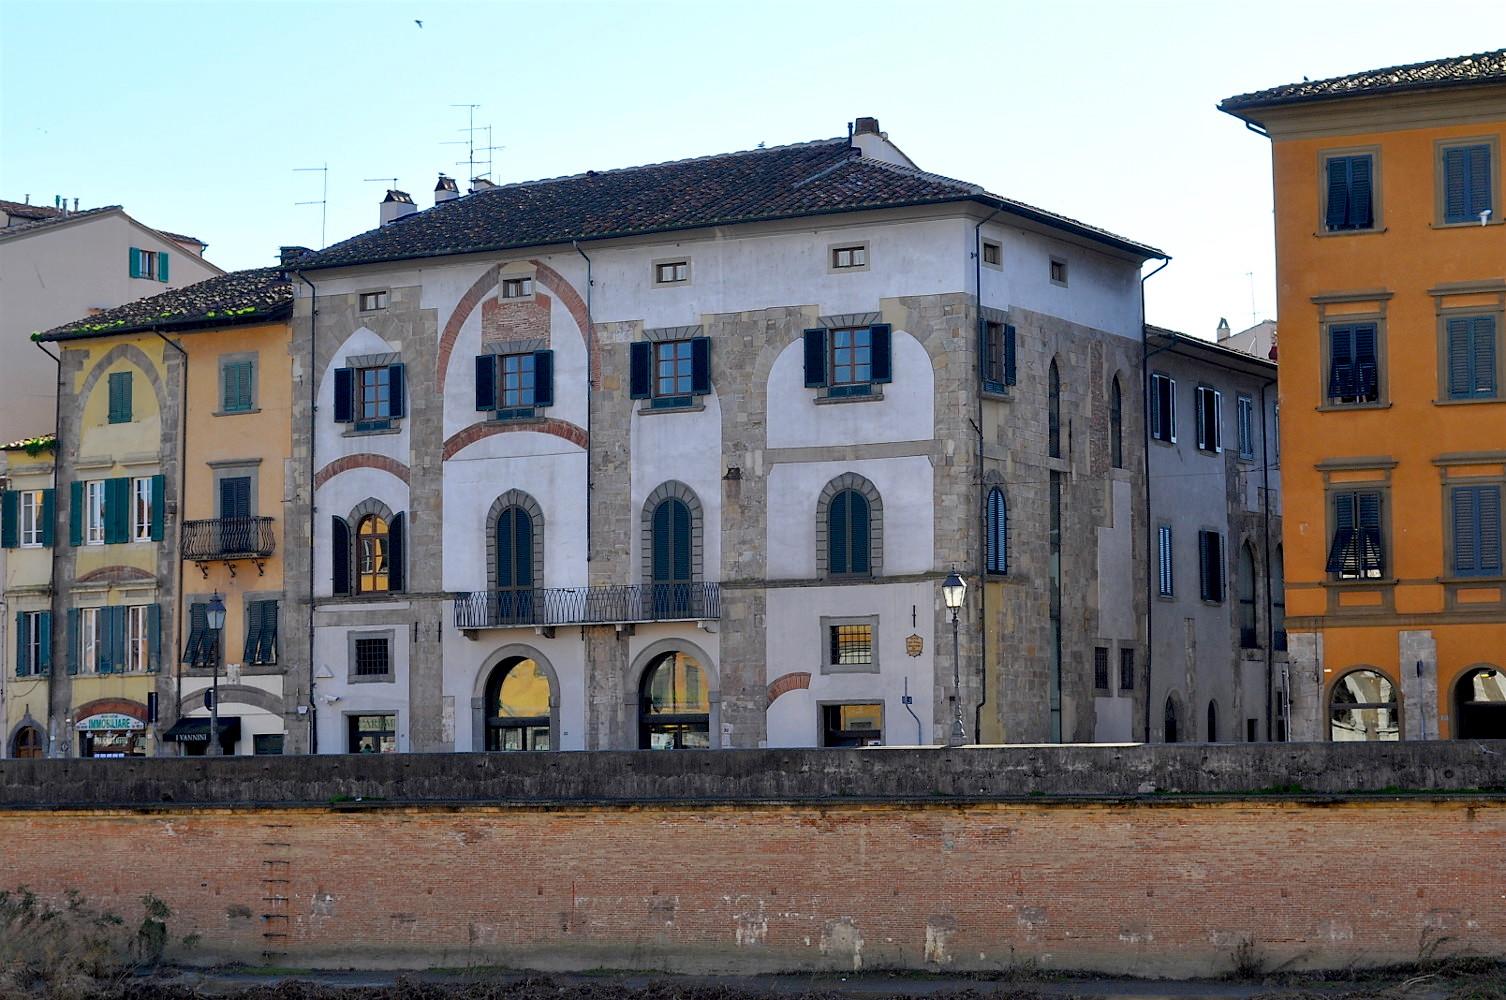 Palazzo Alliata